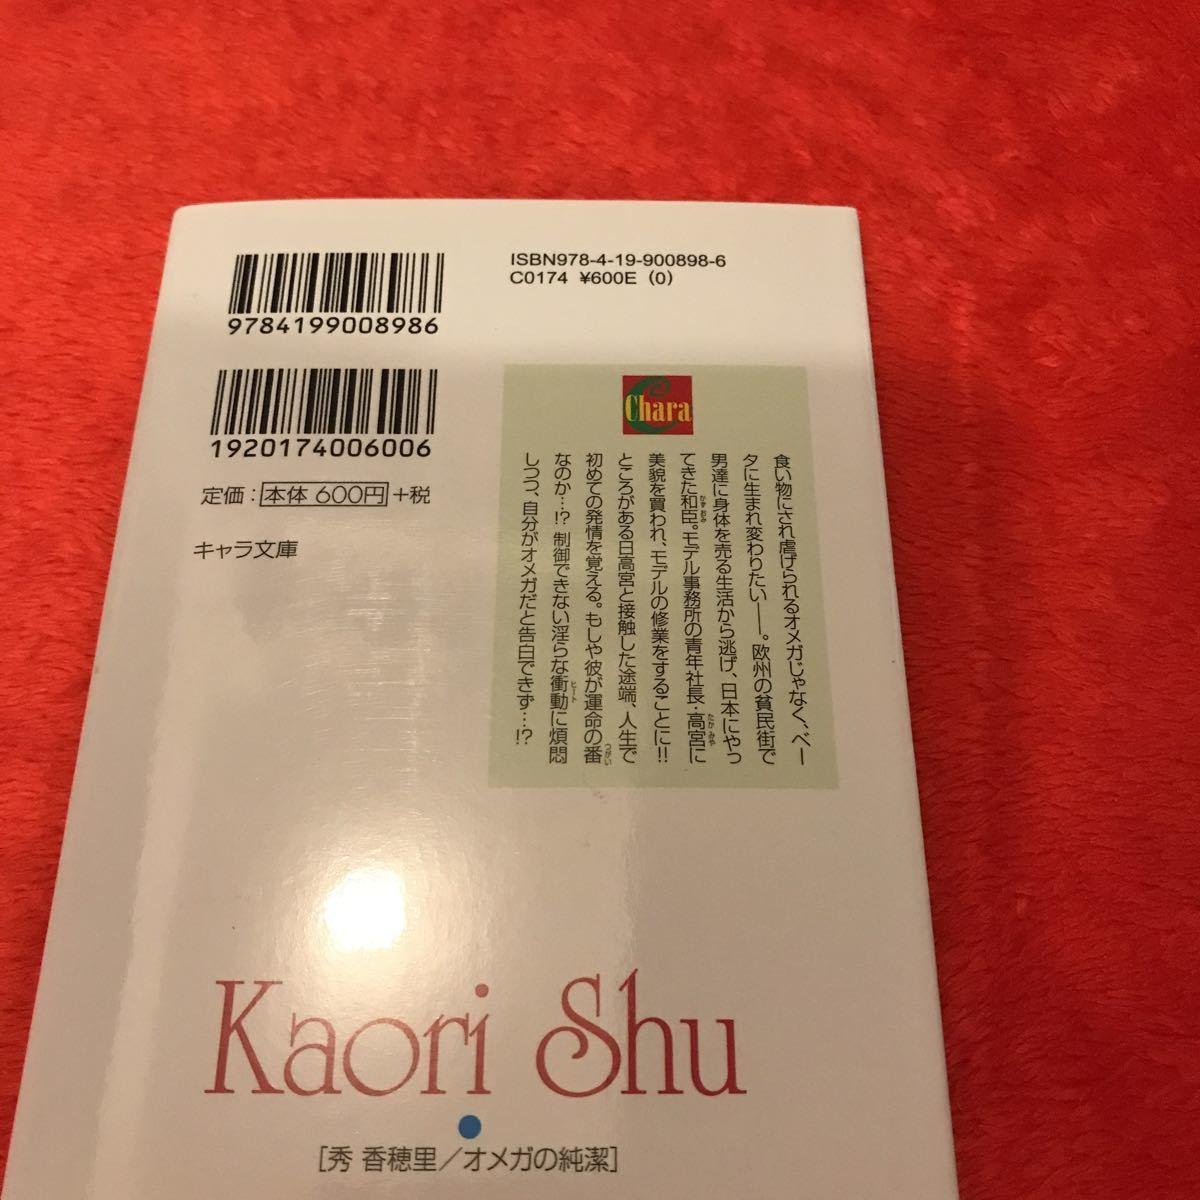 BL小説 文庫本 キャラ 秀香穂里「オメガの純潔」 特典付き イラストカード プレミアムペーパーセレクション みずかねりょう